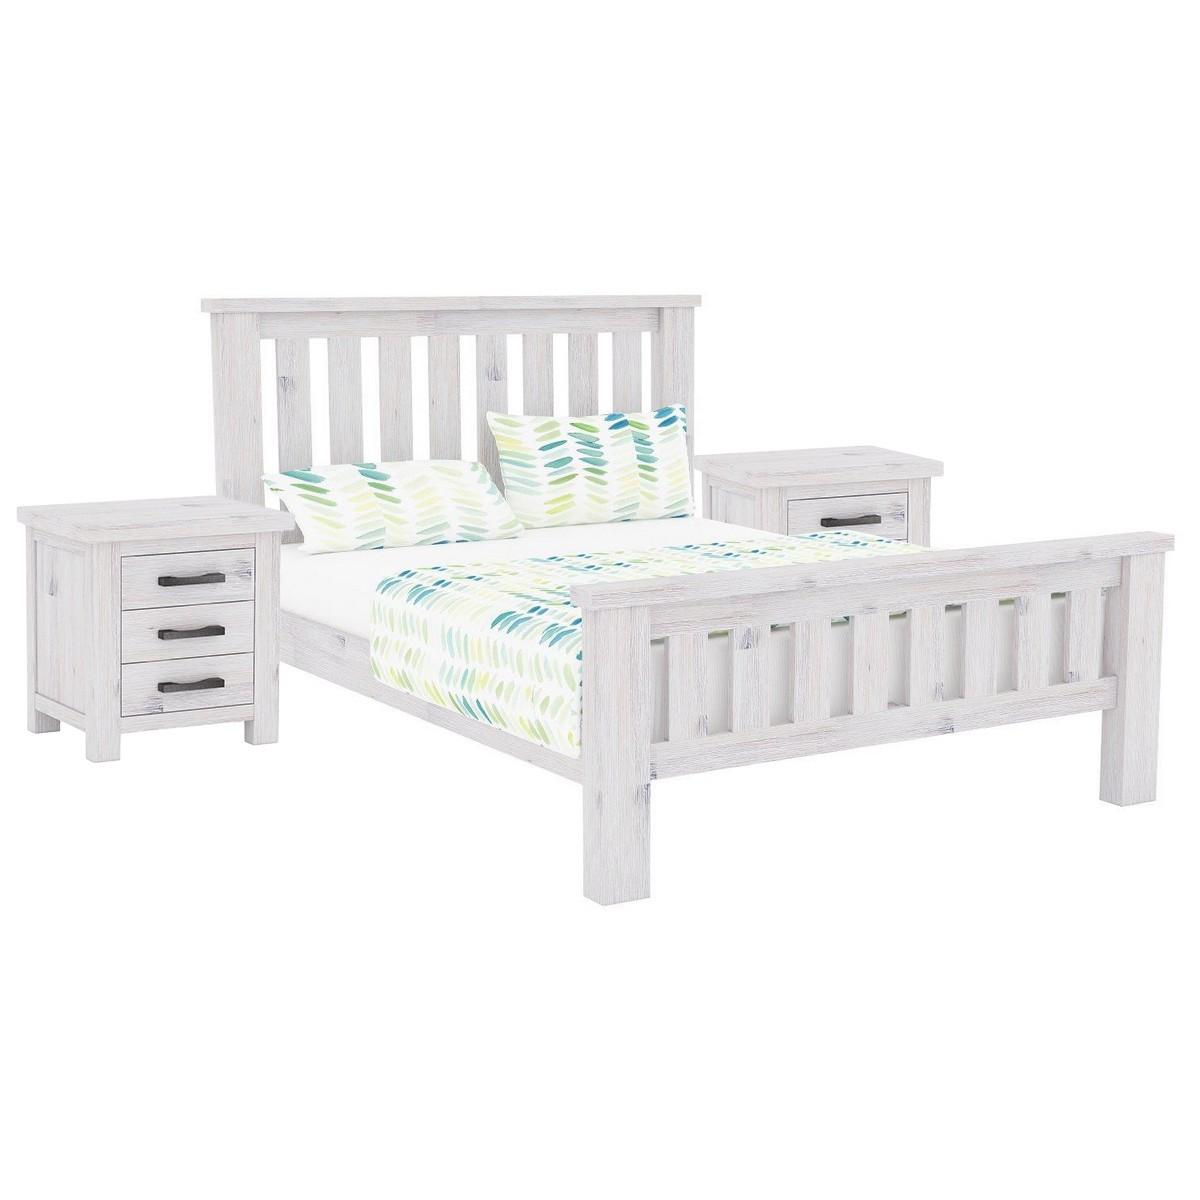 Brockport 3 Piece Acacia Timber Bed & Bedside Set, King